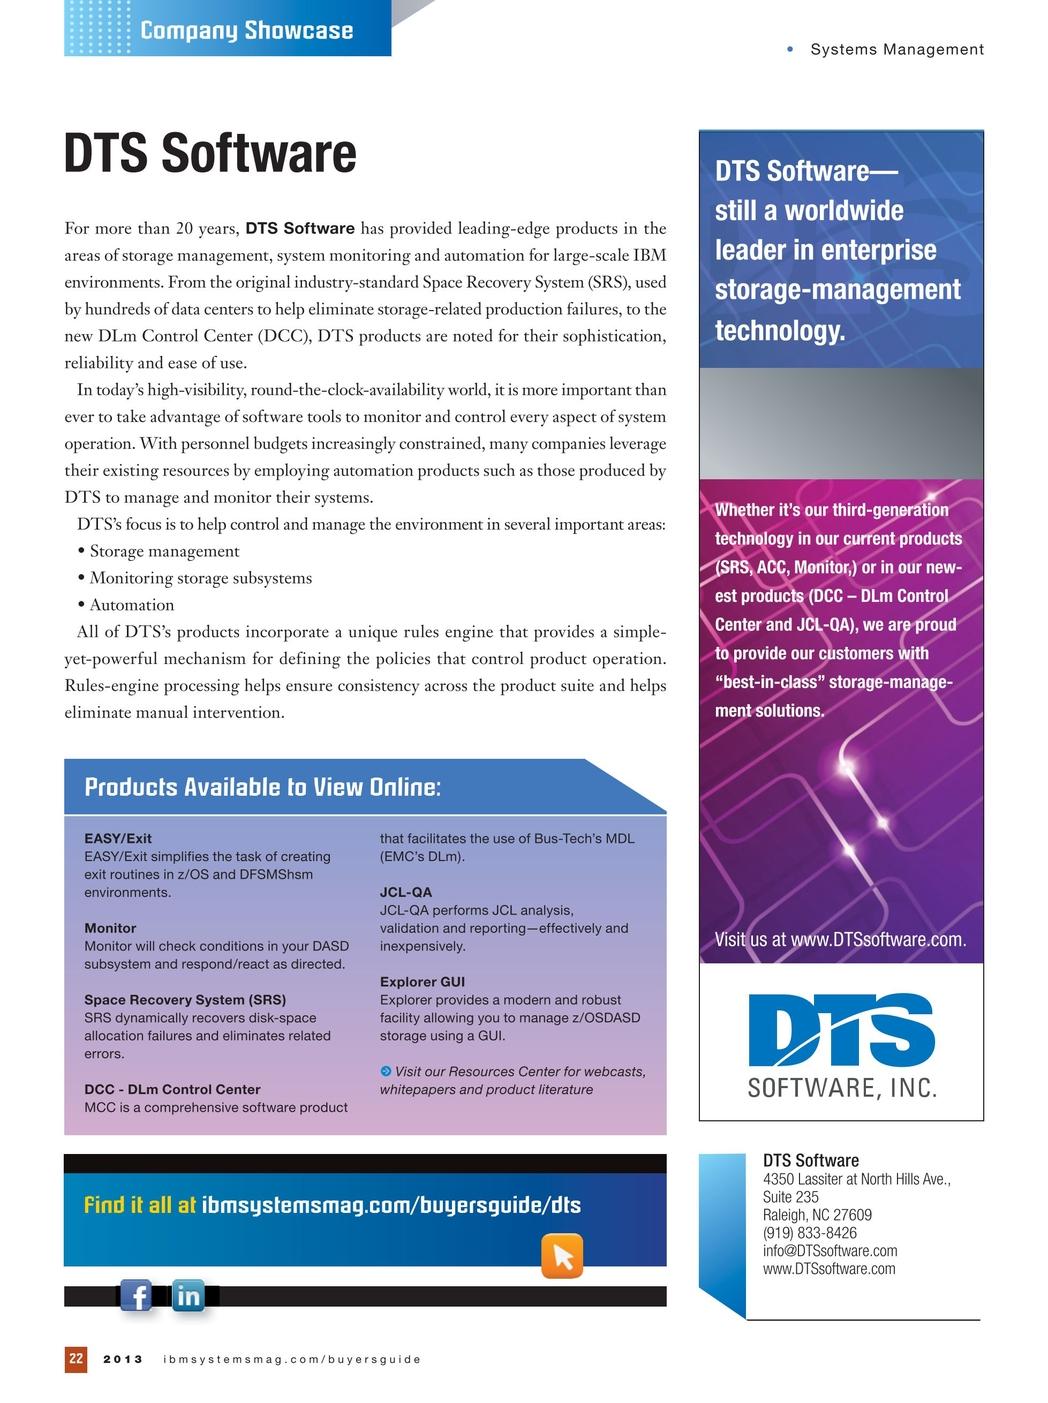 Ibm syncsort manual array ibm systems magazine mainframe edition 2013 buyer u0027s guide rh ibmsystemsmagmainframedigital fandeluxe Images